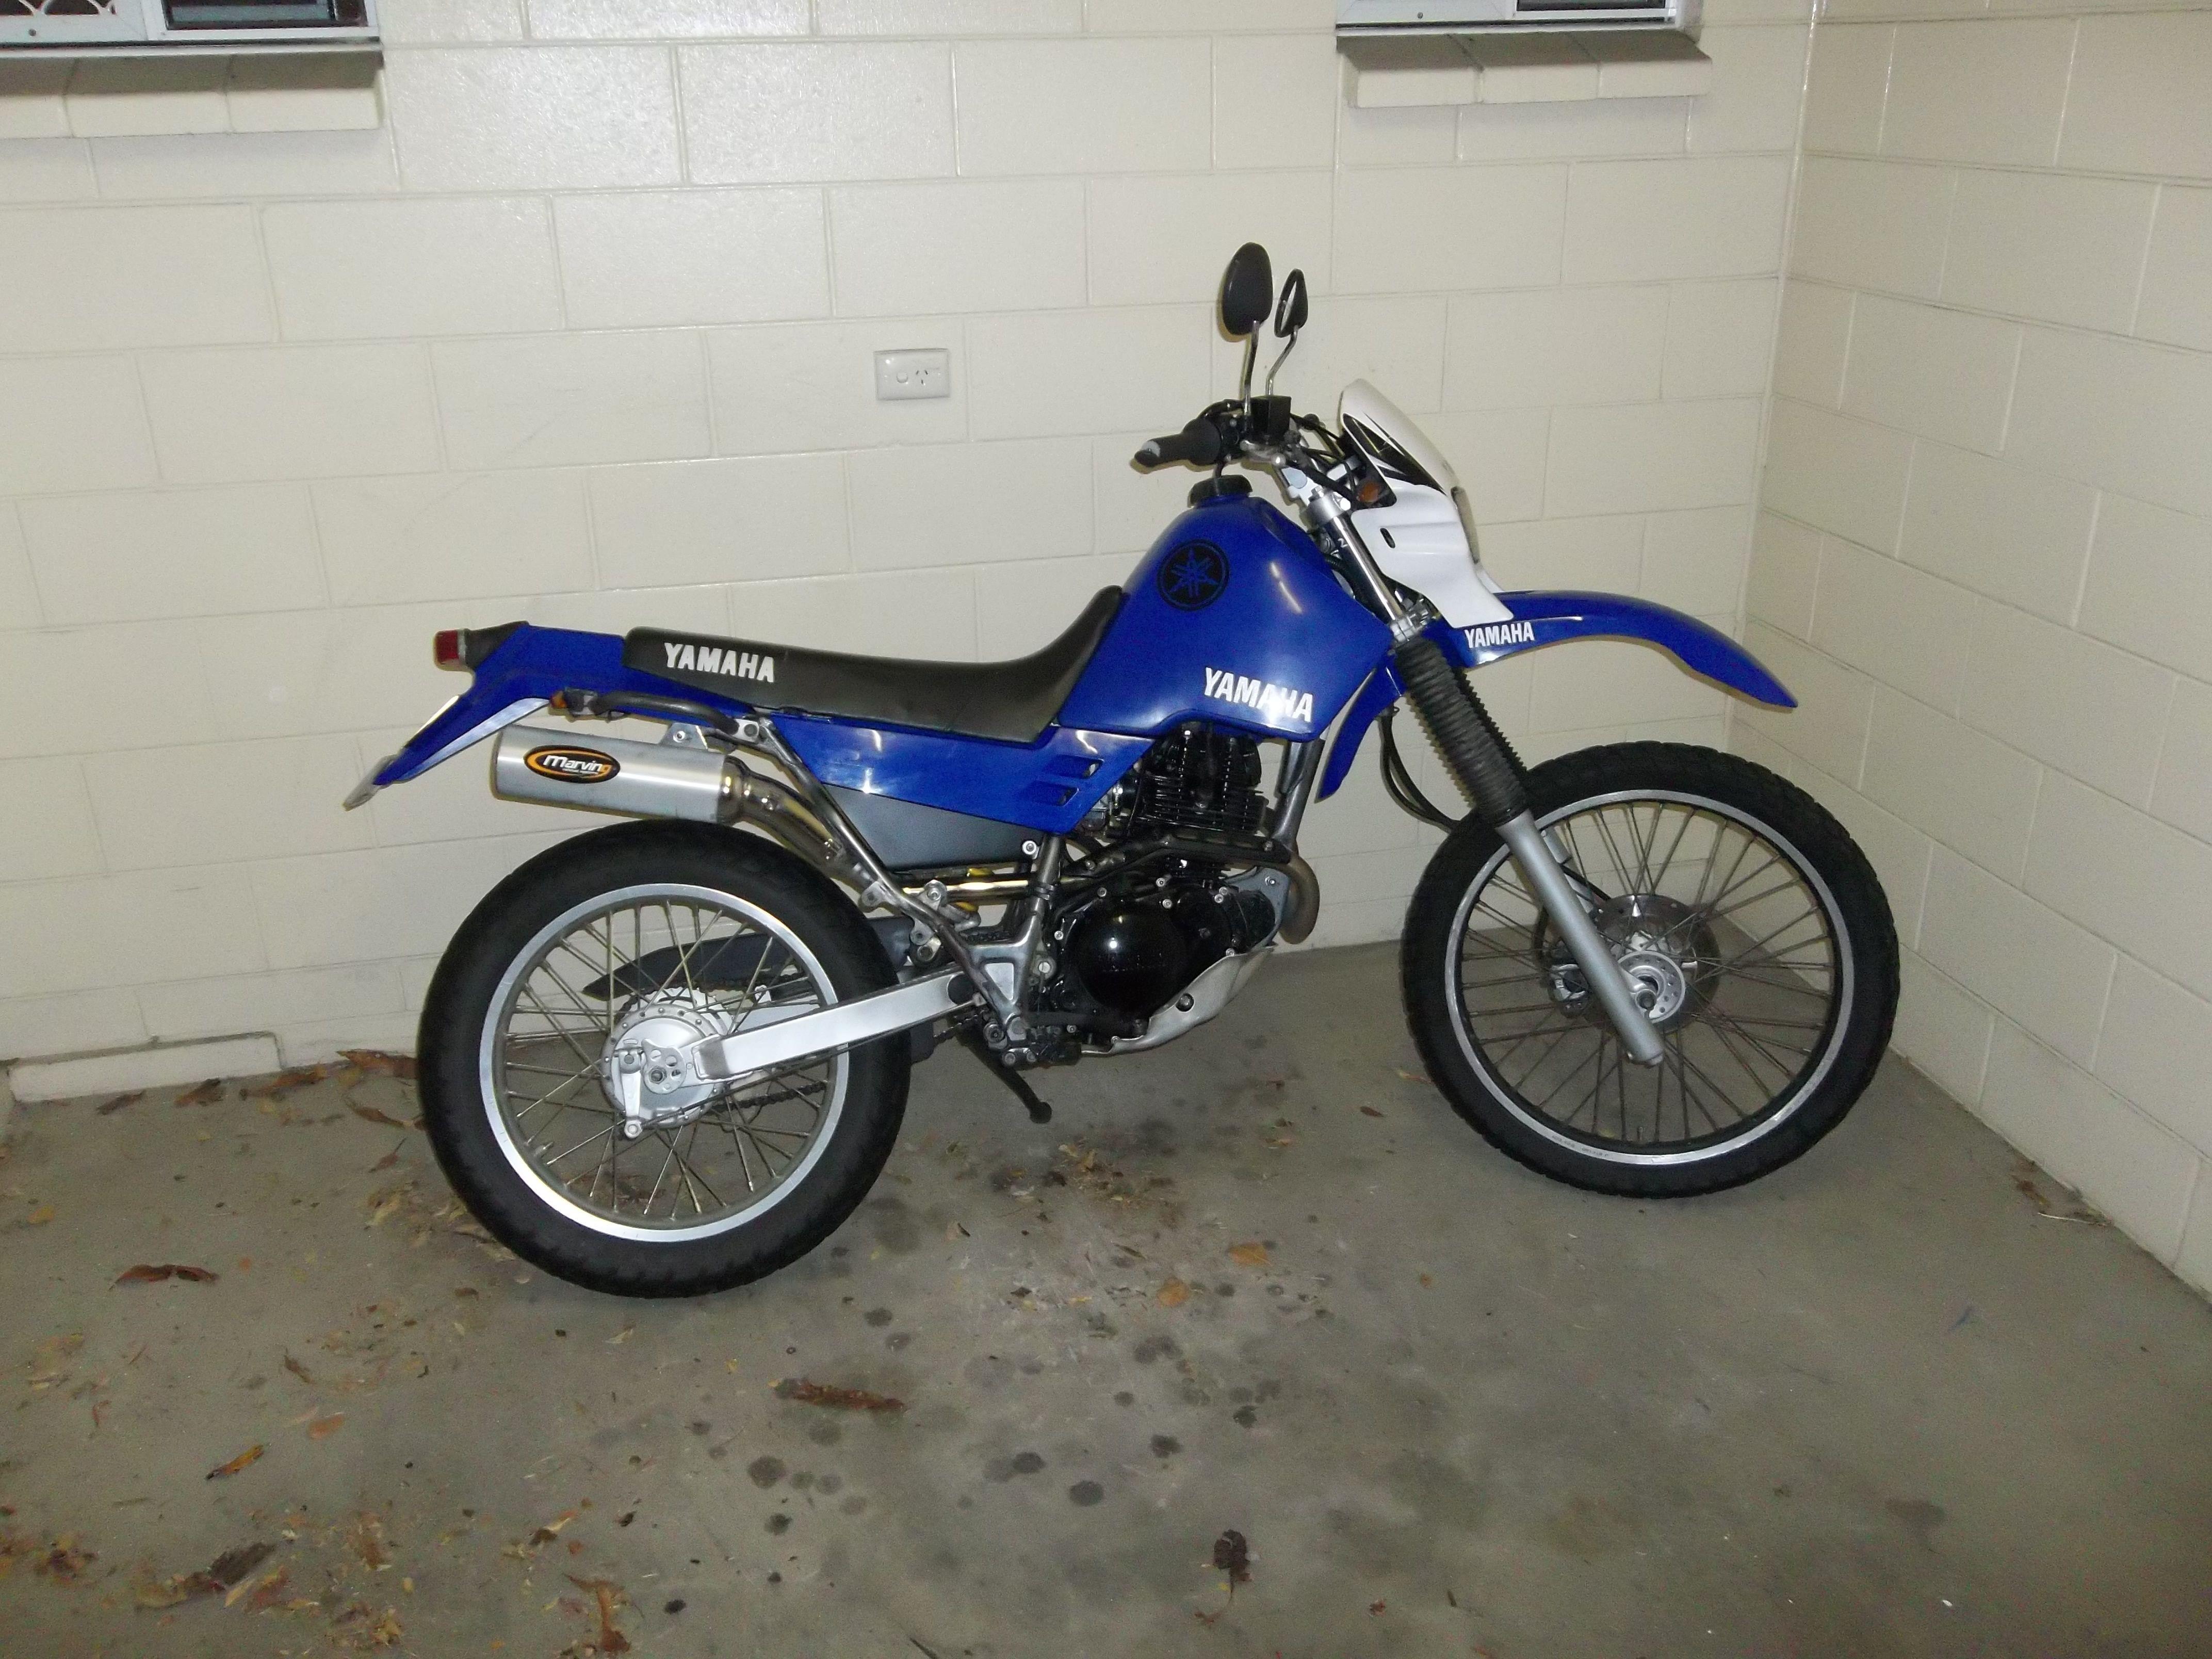 Yamaha Papercraft Motorcycle Yamaha Xt225 Xt 225